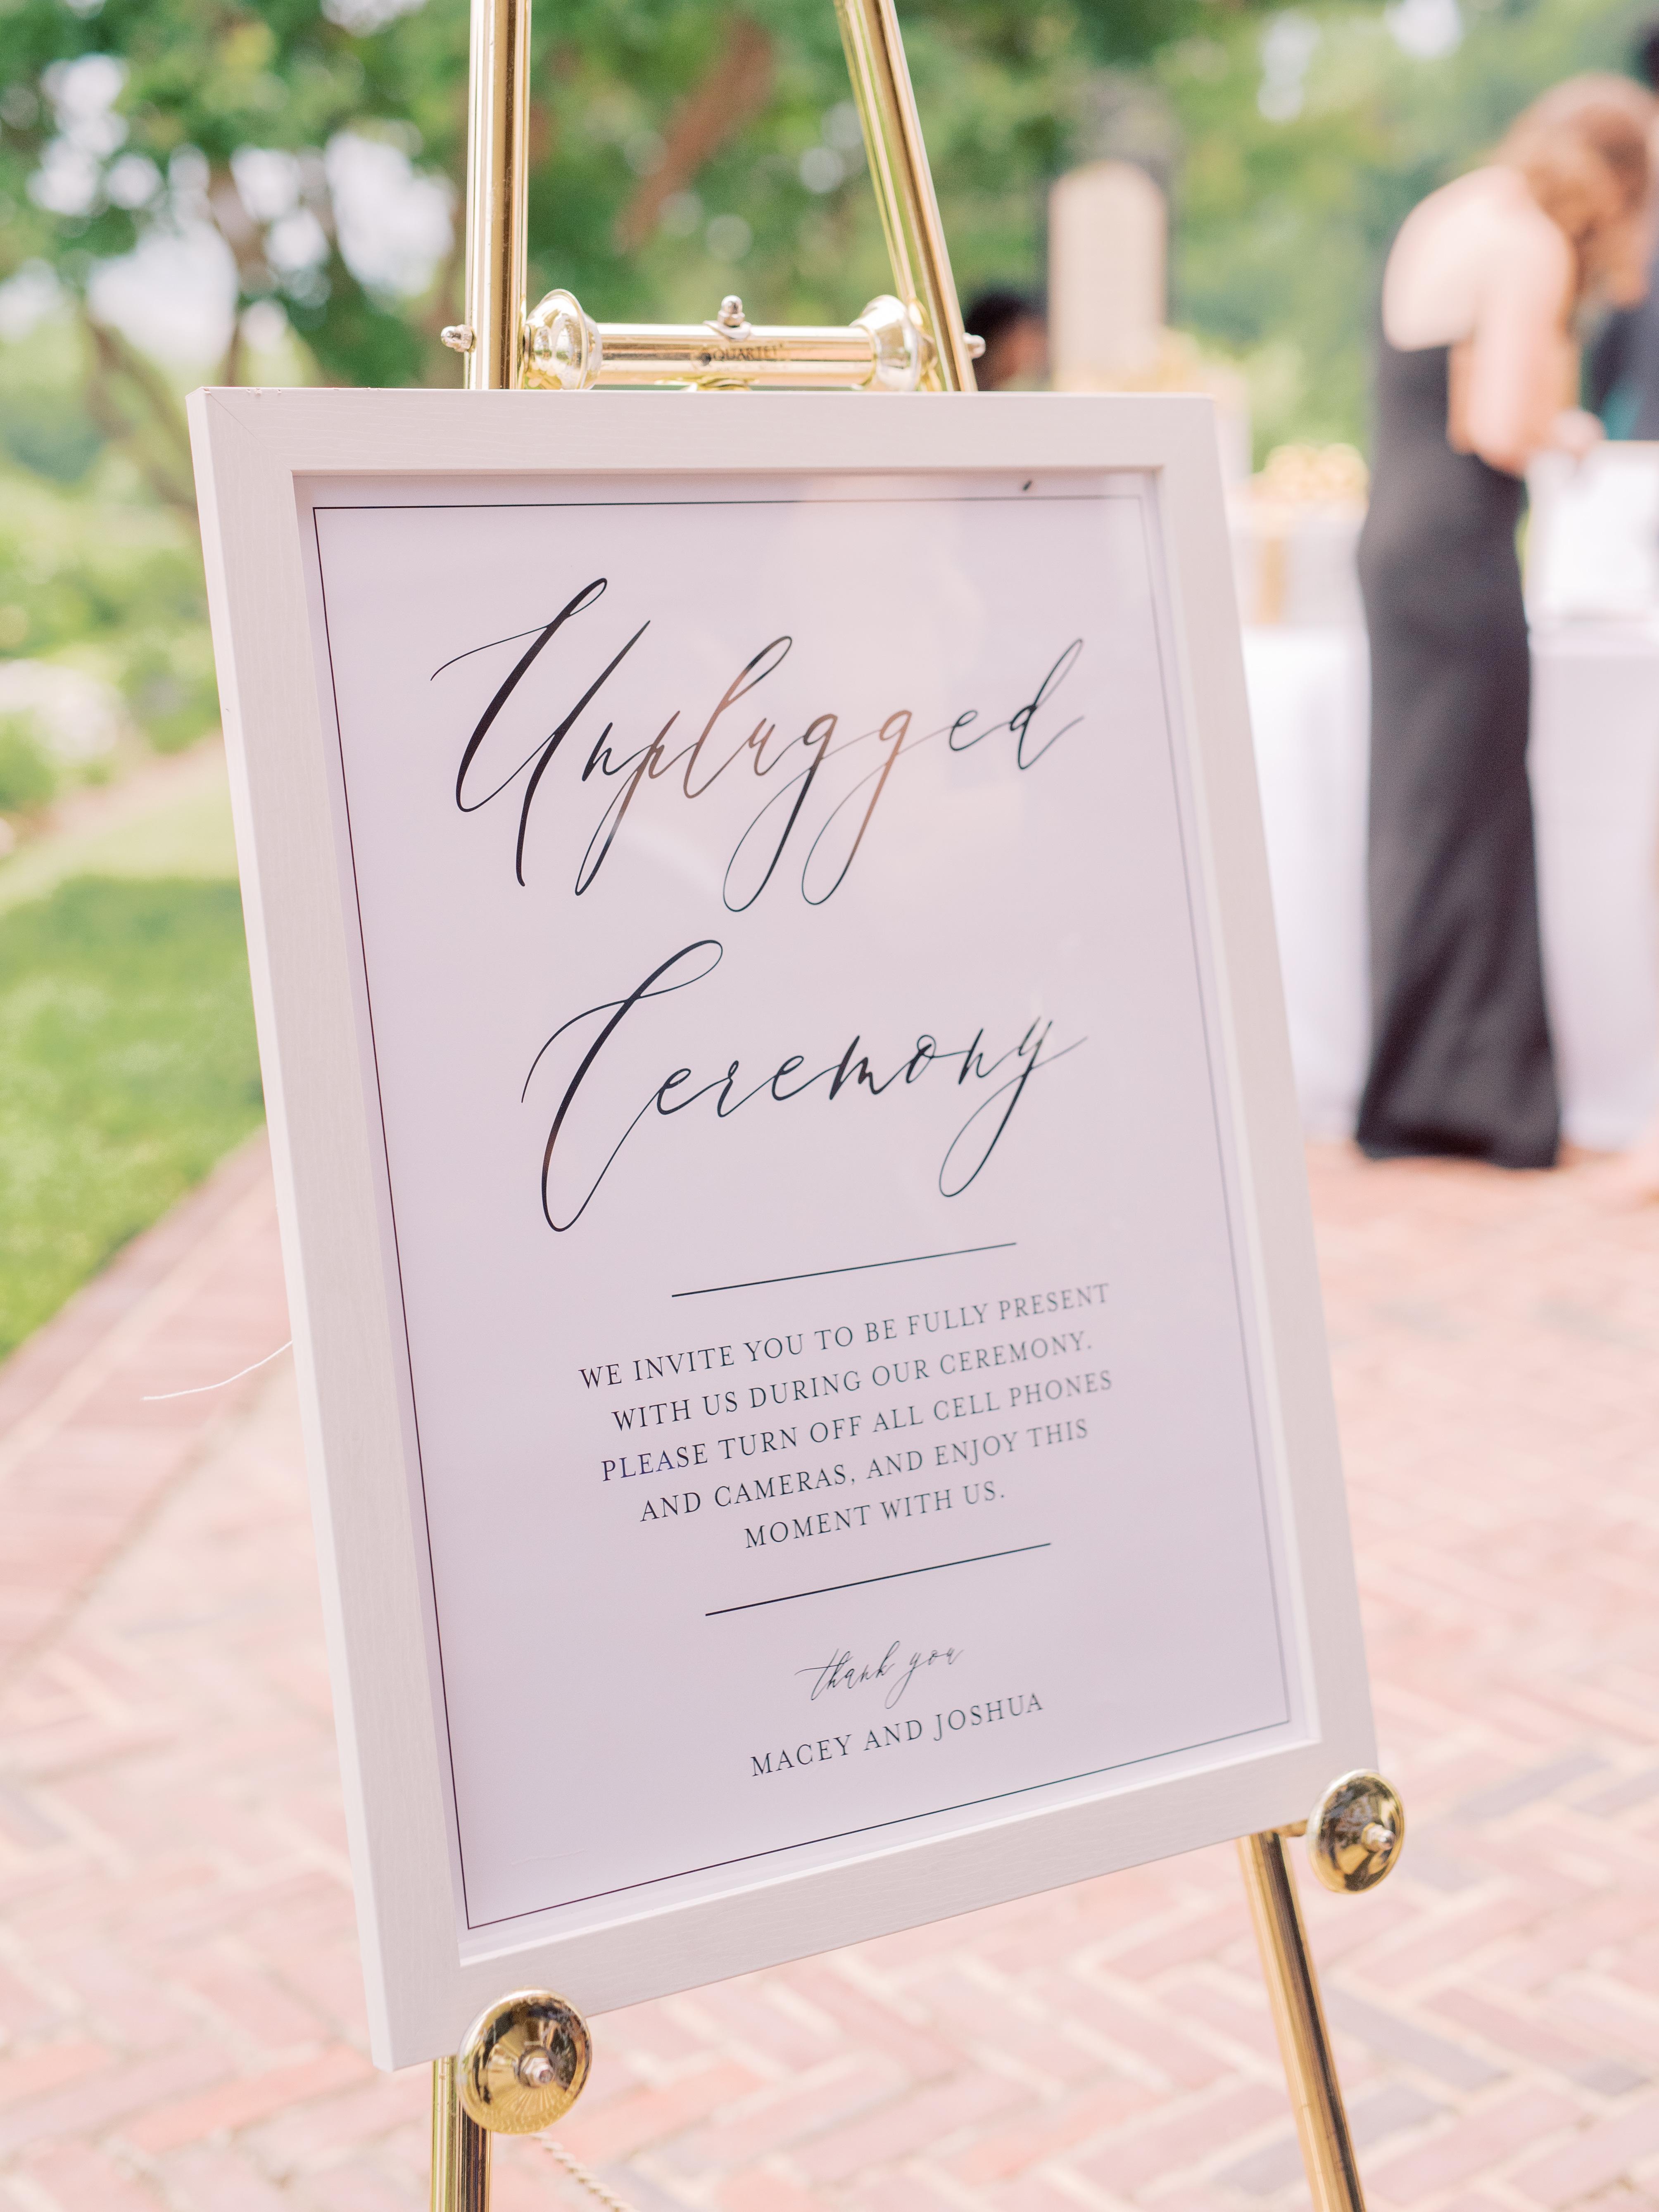 macey joshua unplugged wedding sign